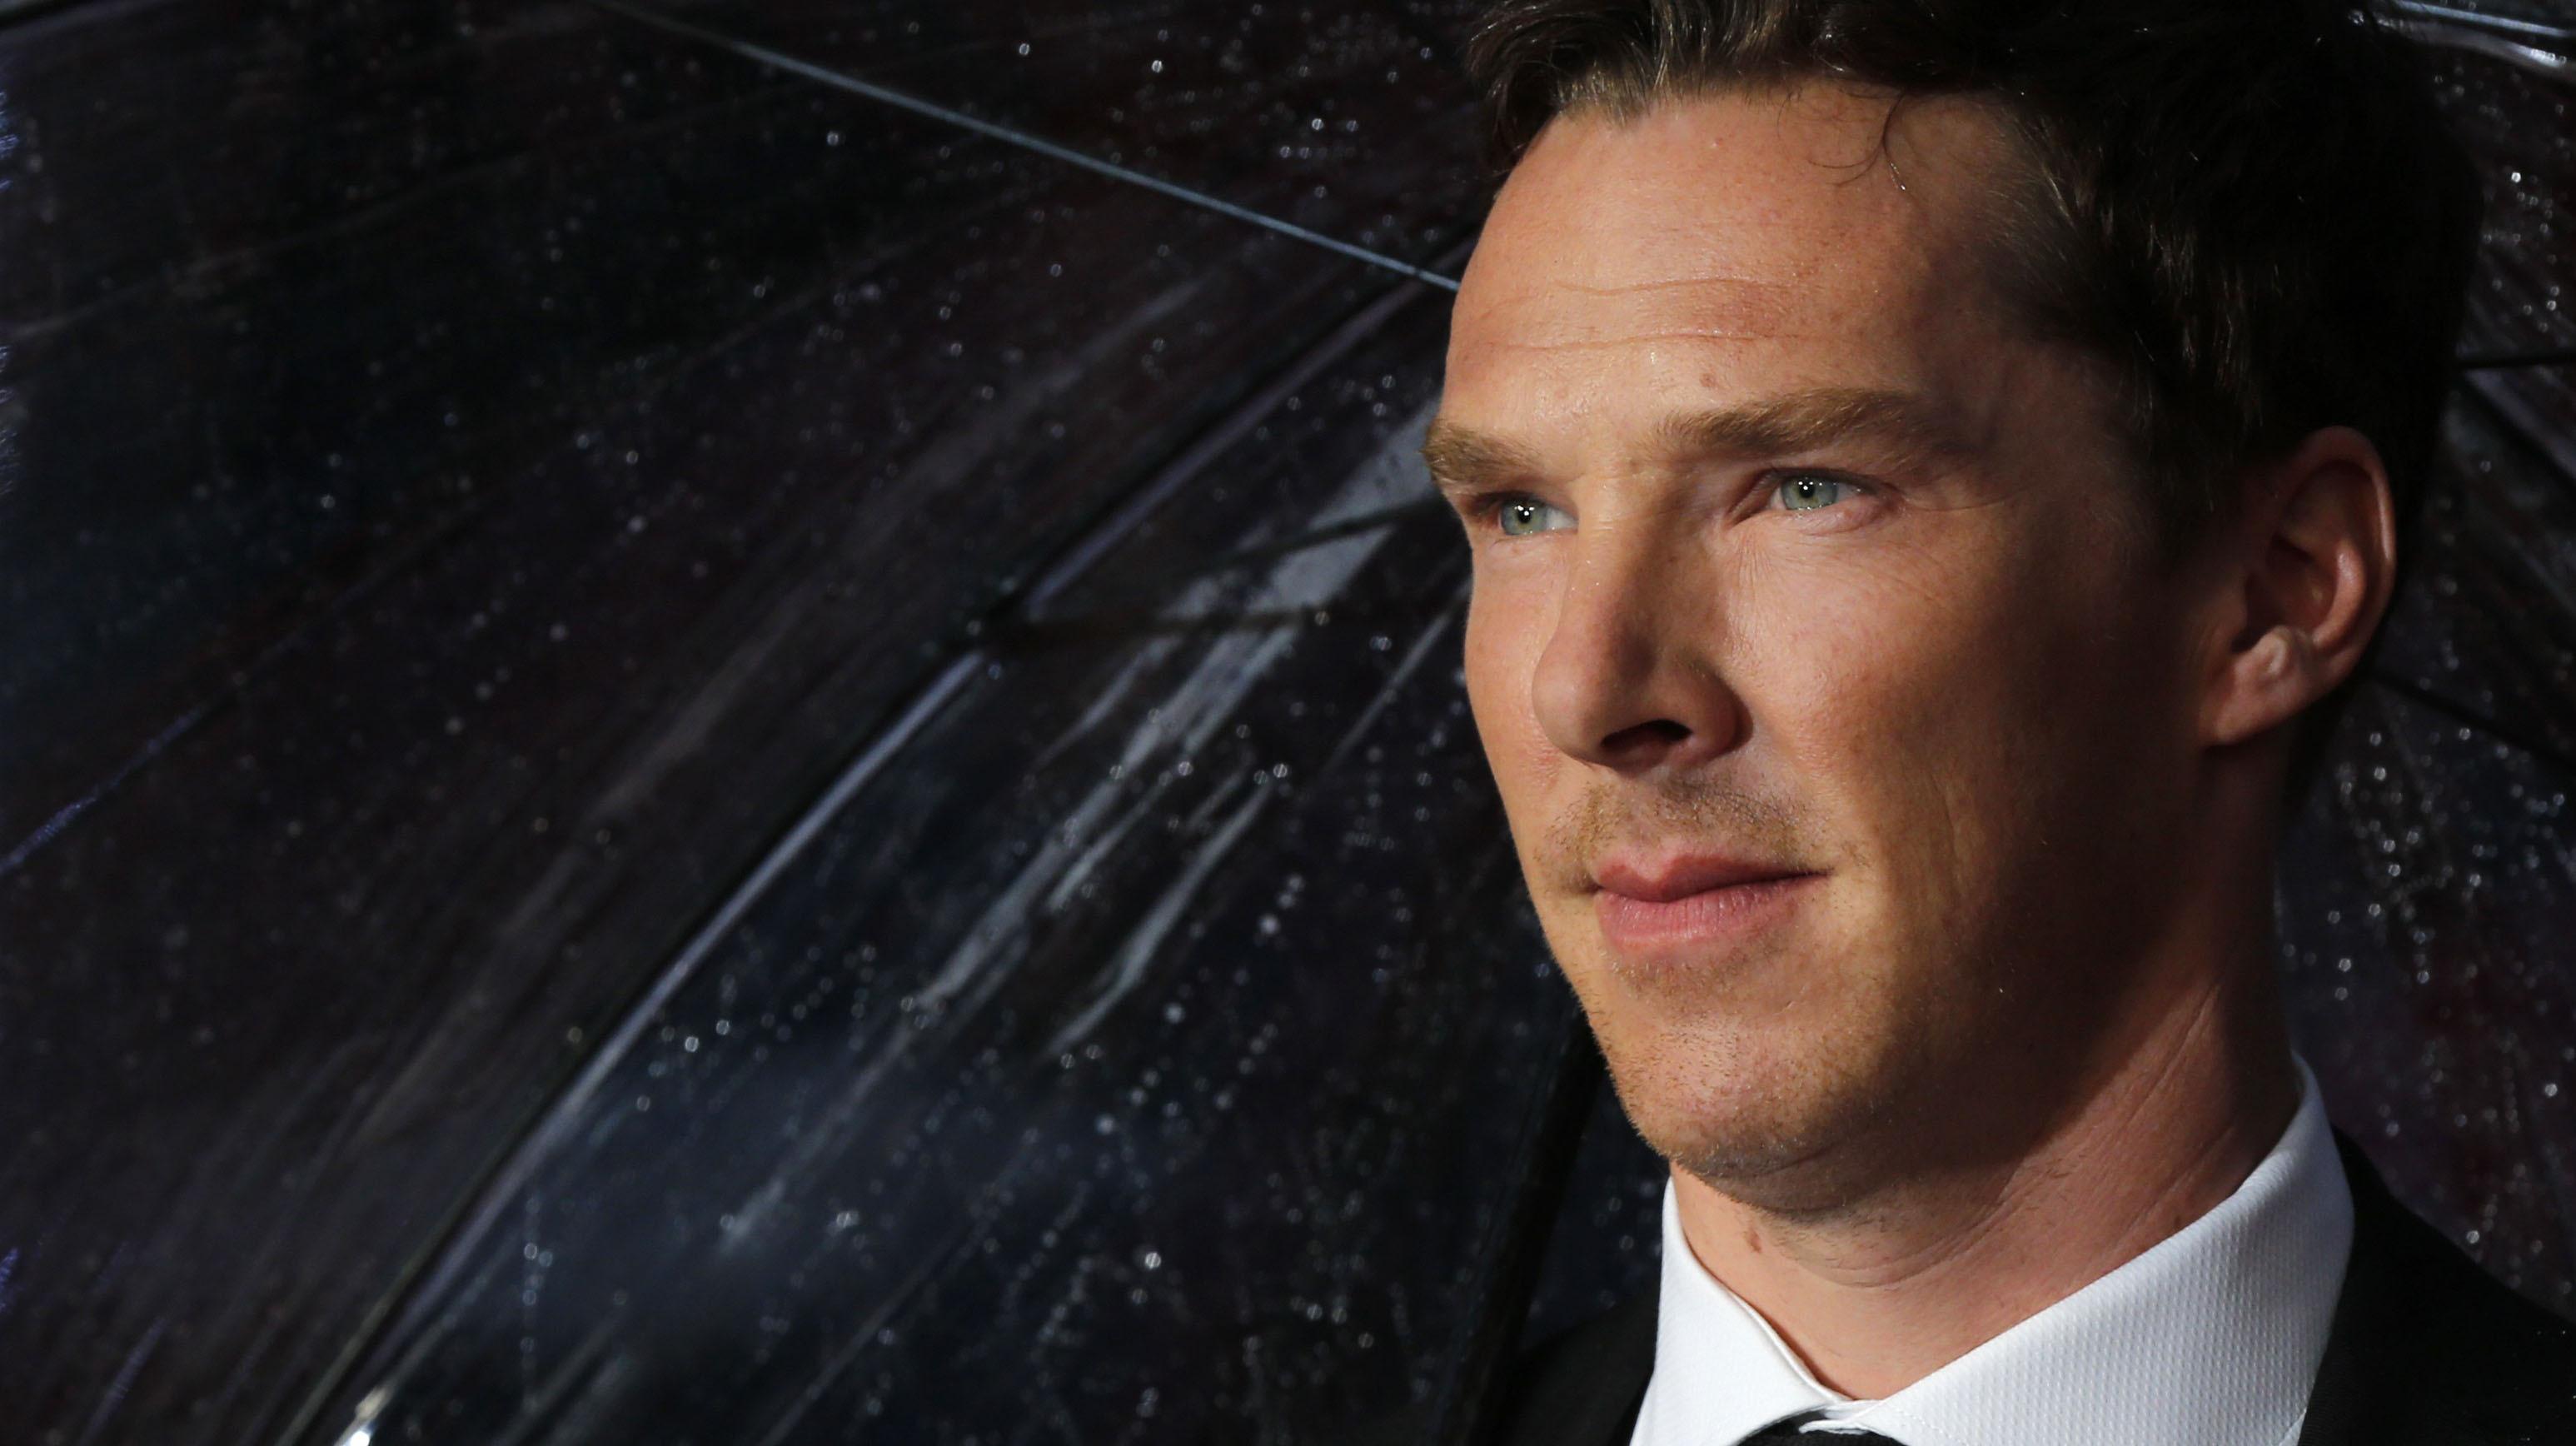 Benedict Cumberbatch Full Hd